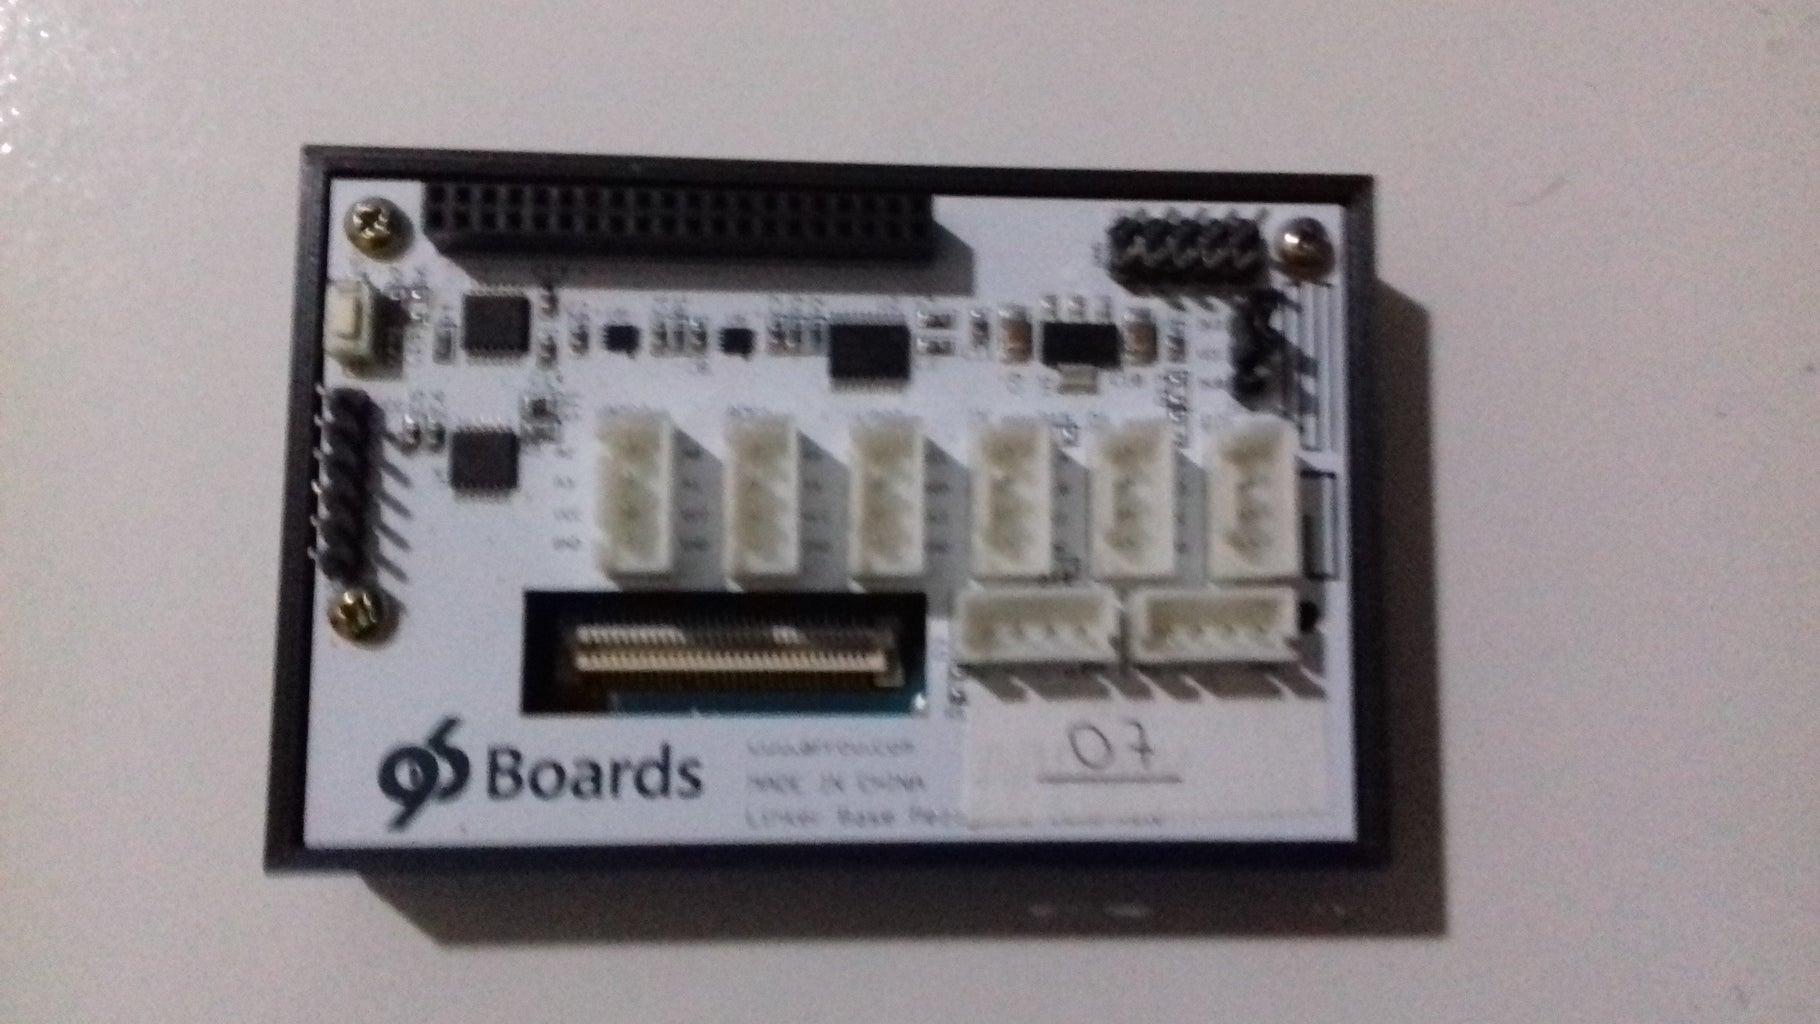 Conectando E Configurando Sensores